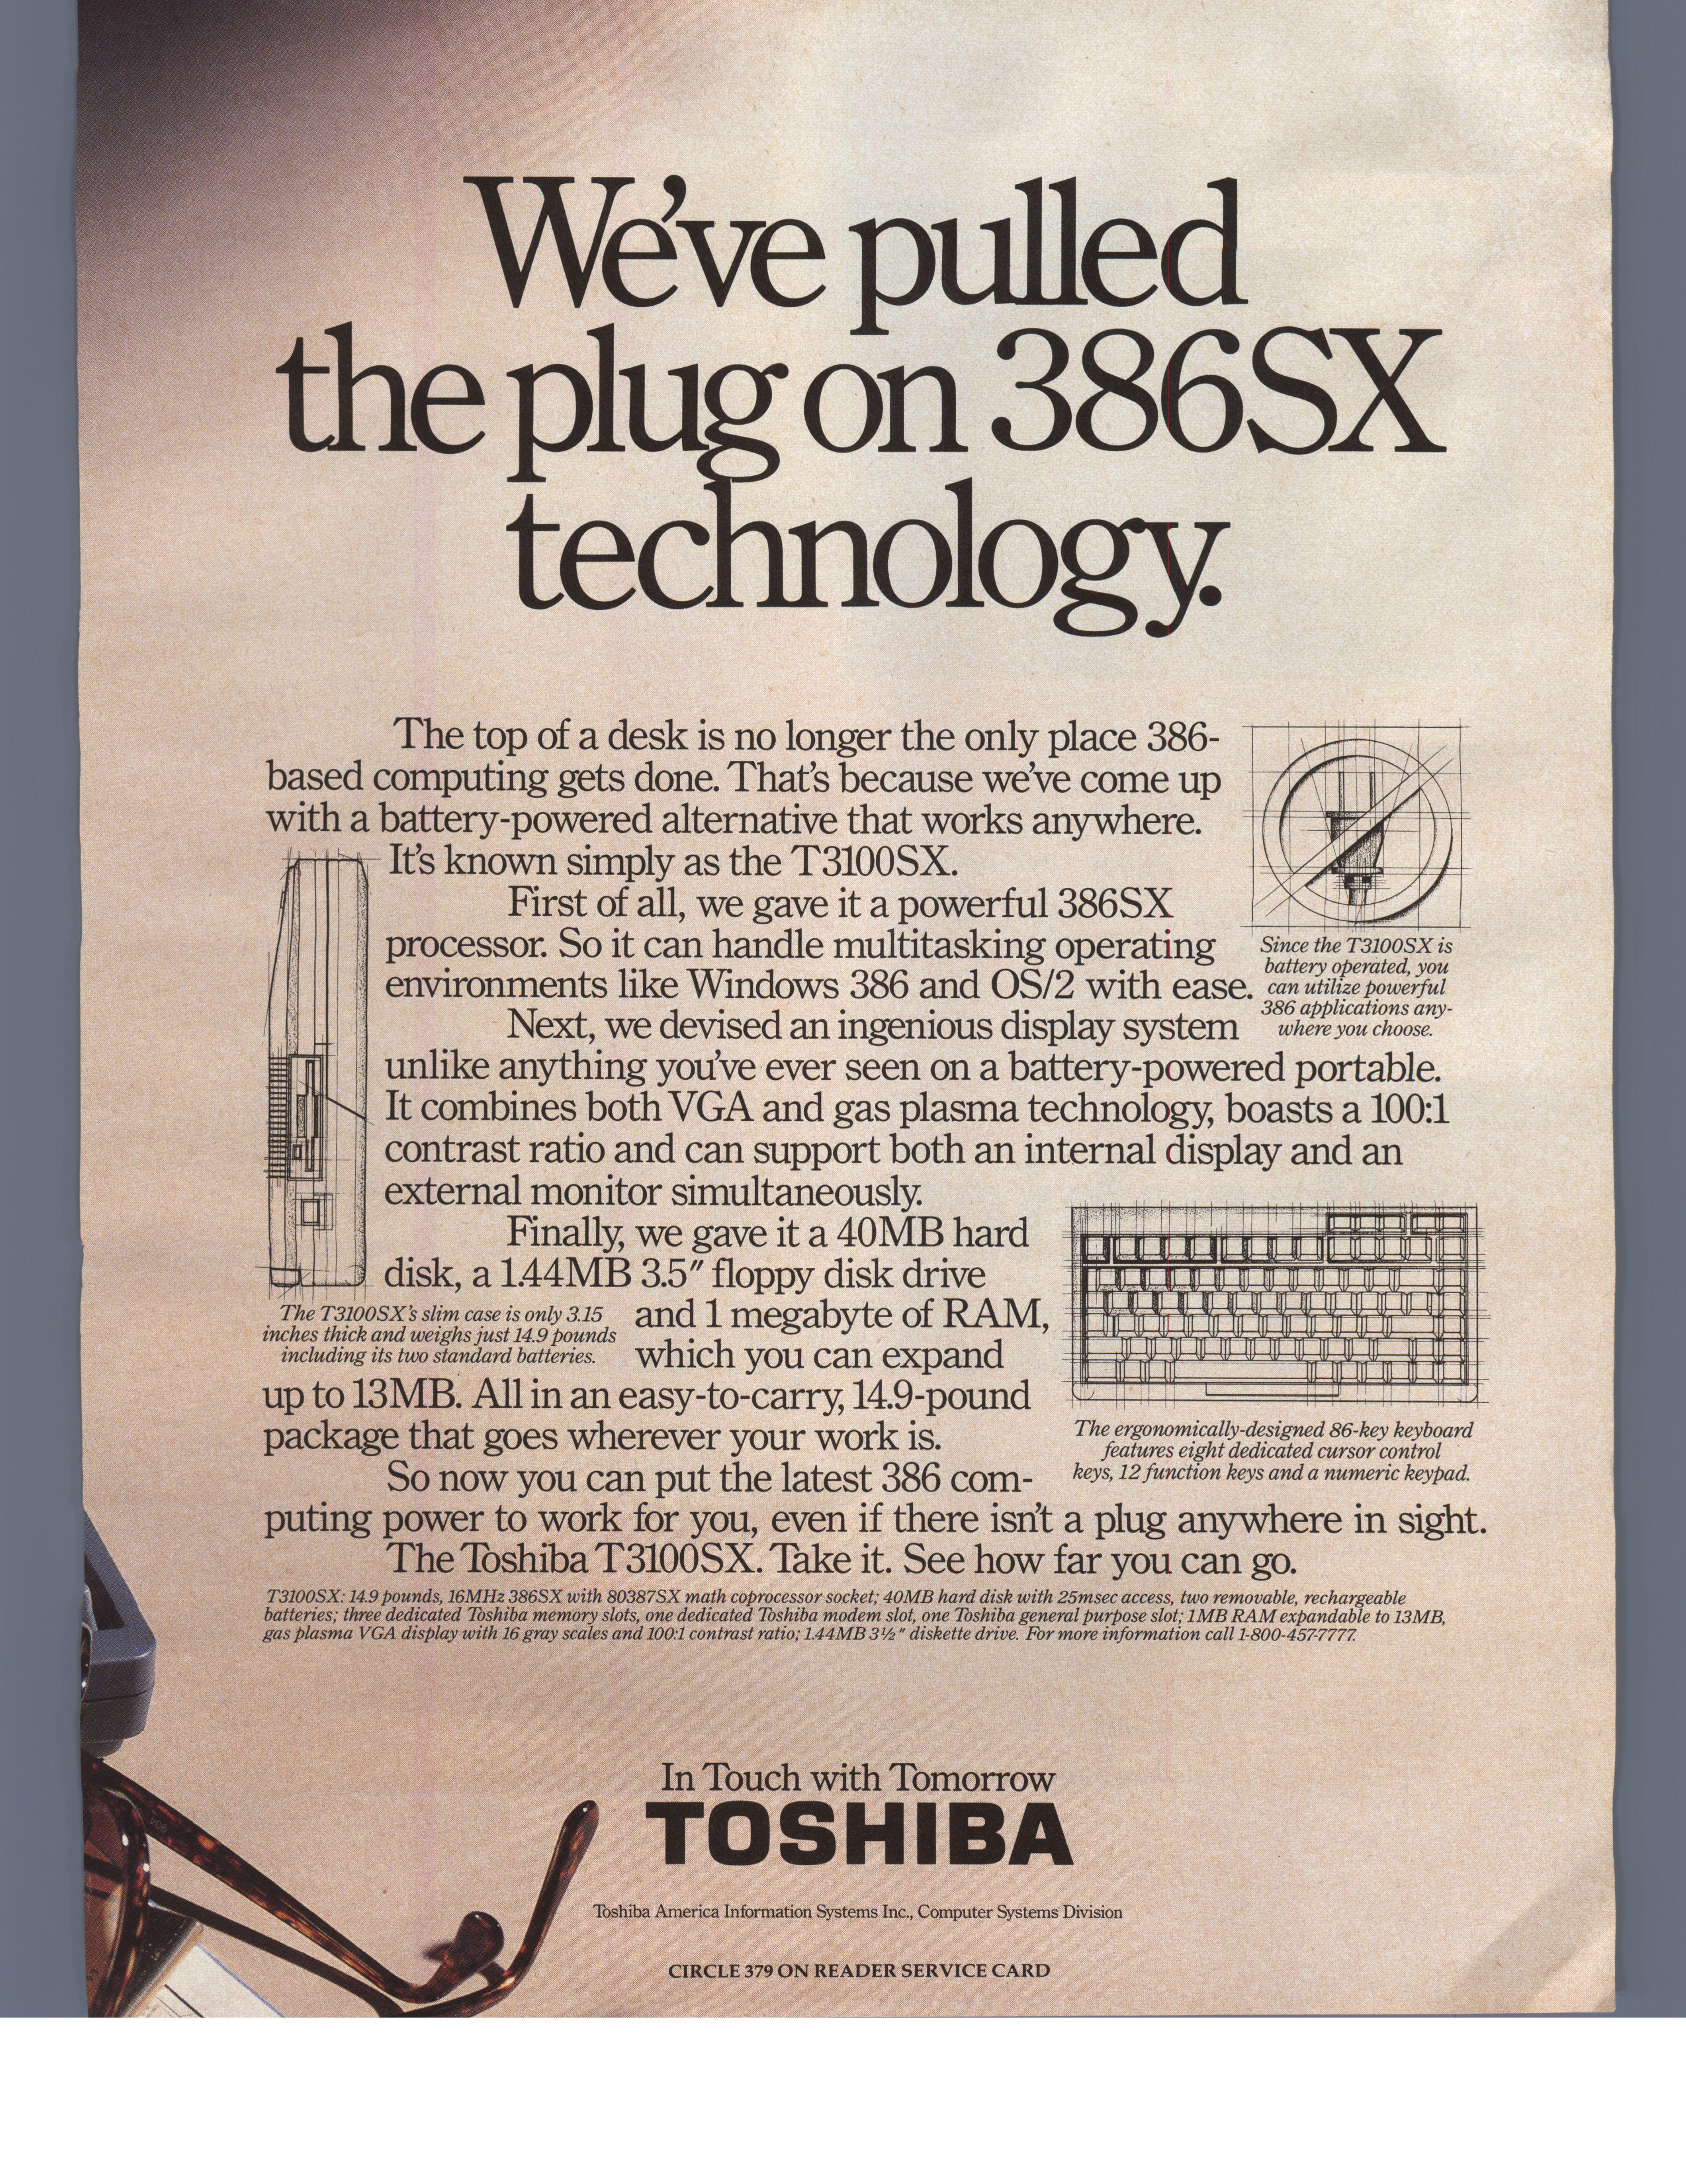 TOSHIBA T3100SX